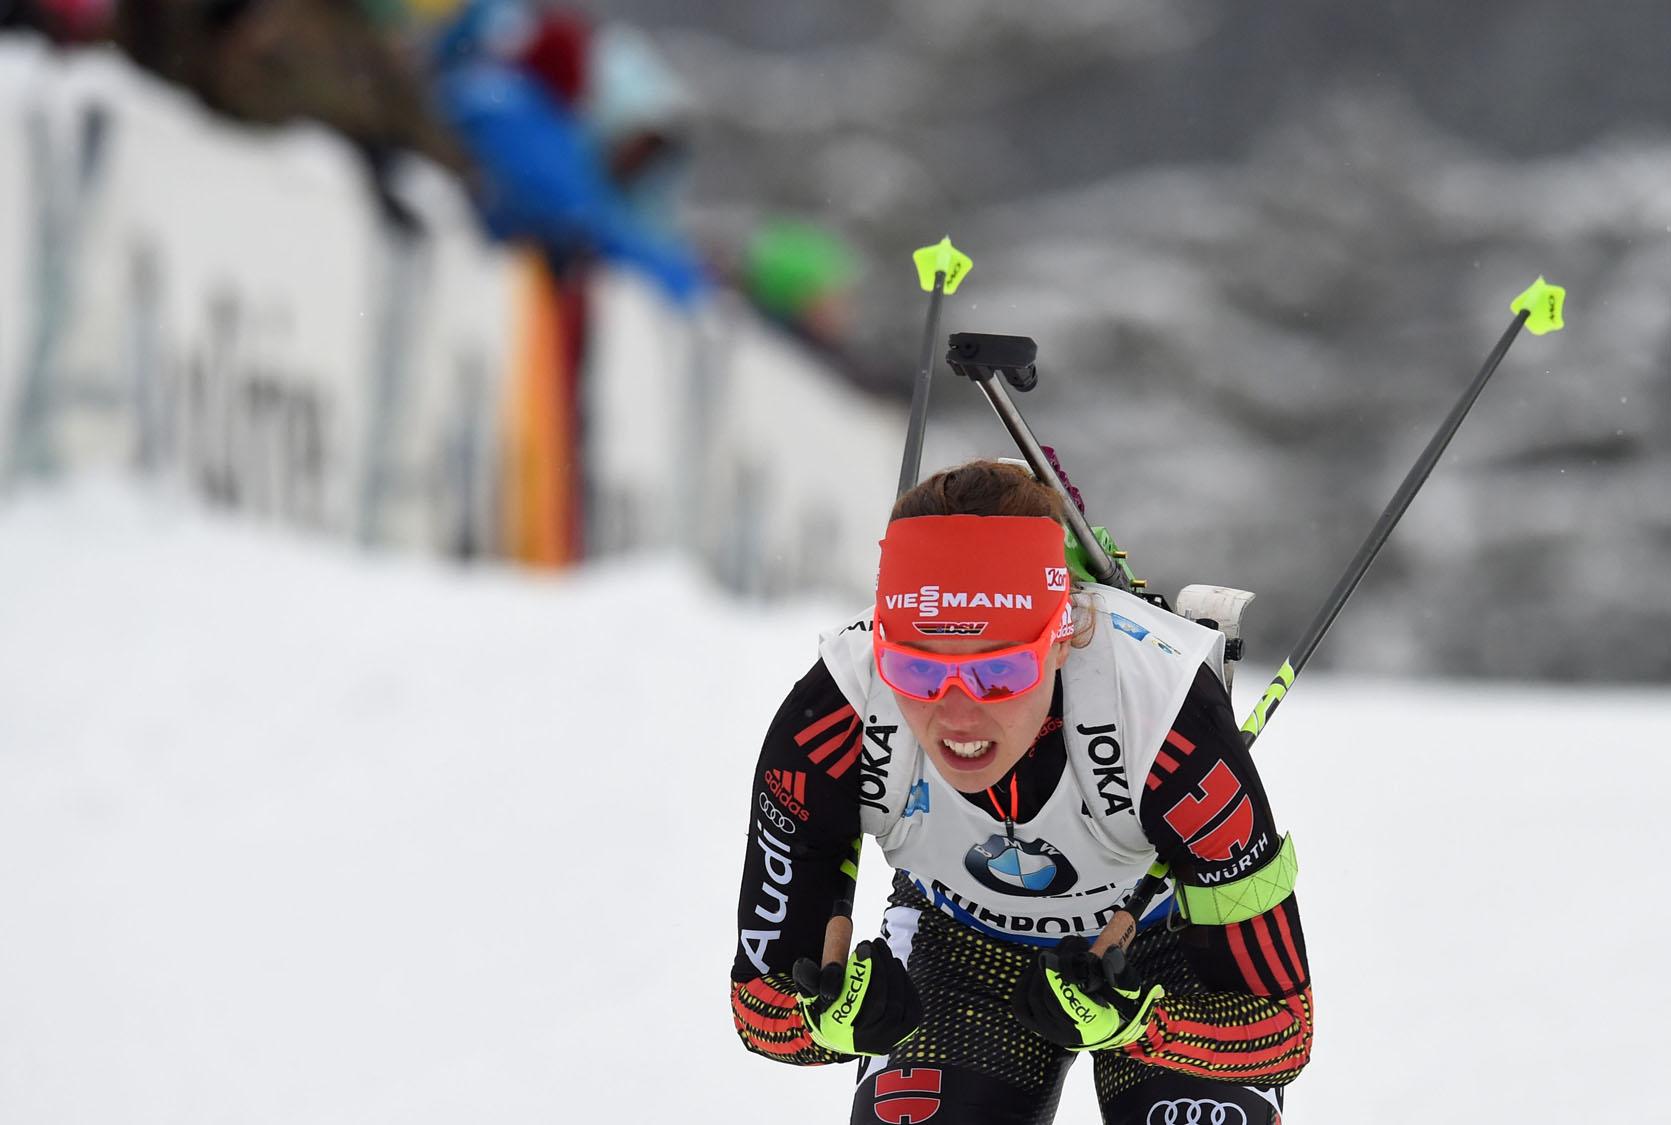 biathlon world cup 2017